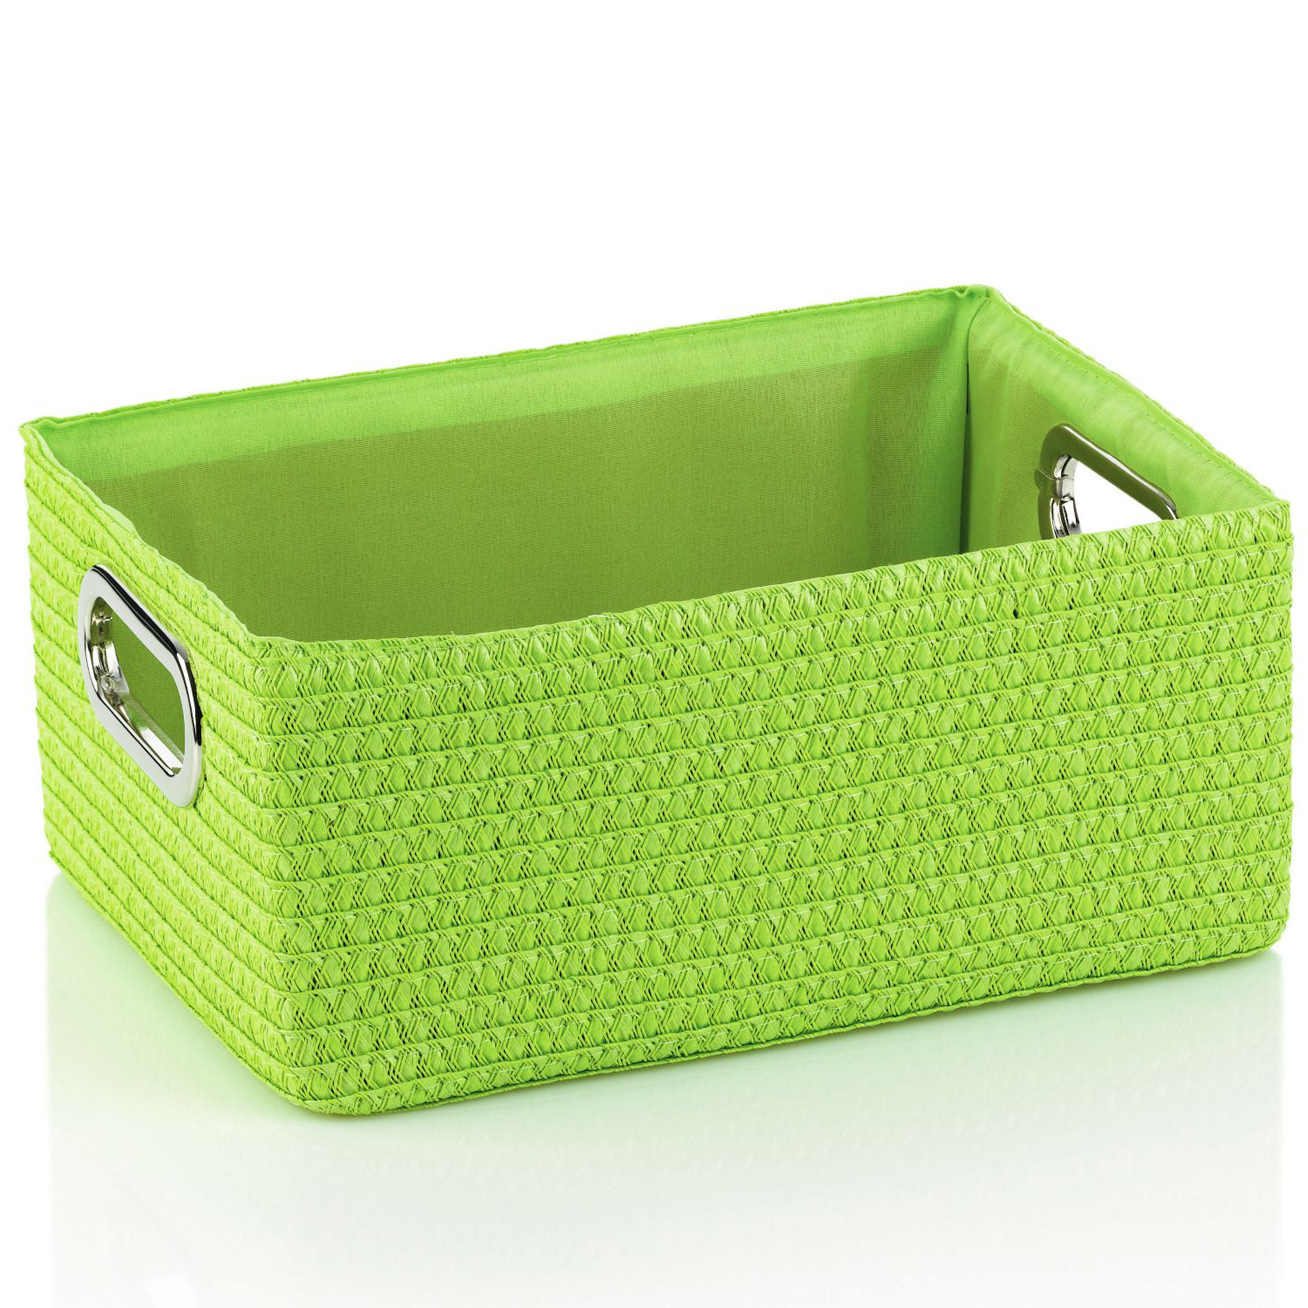 korb kiste box k rbchen aufbewahrungskorb dekokorb. Black Bedroom Furniture Sets. Home Design Ideas